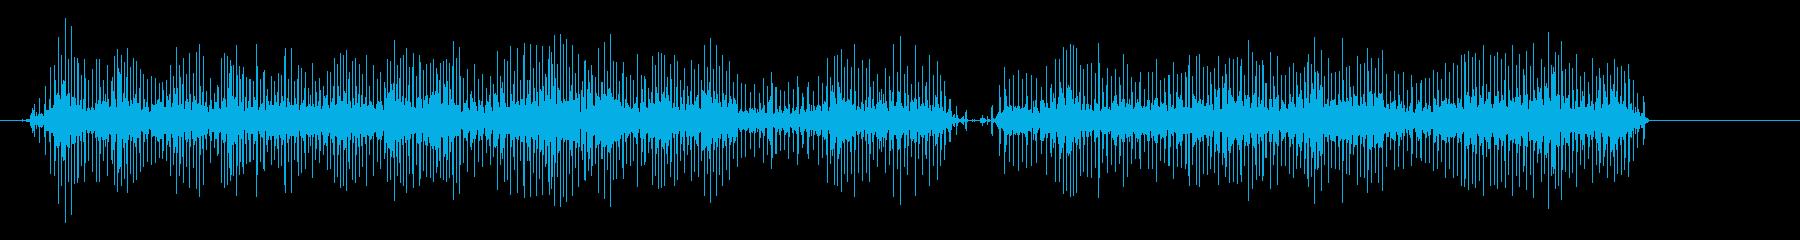 35mmシネマプロジェクターの再生済みの波形